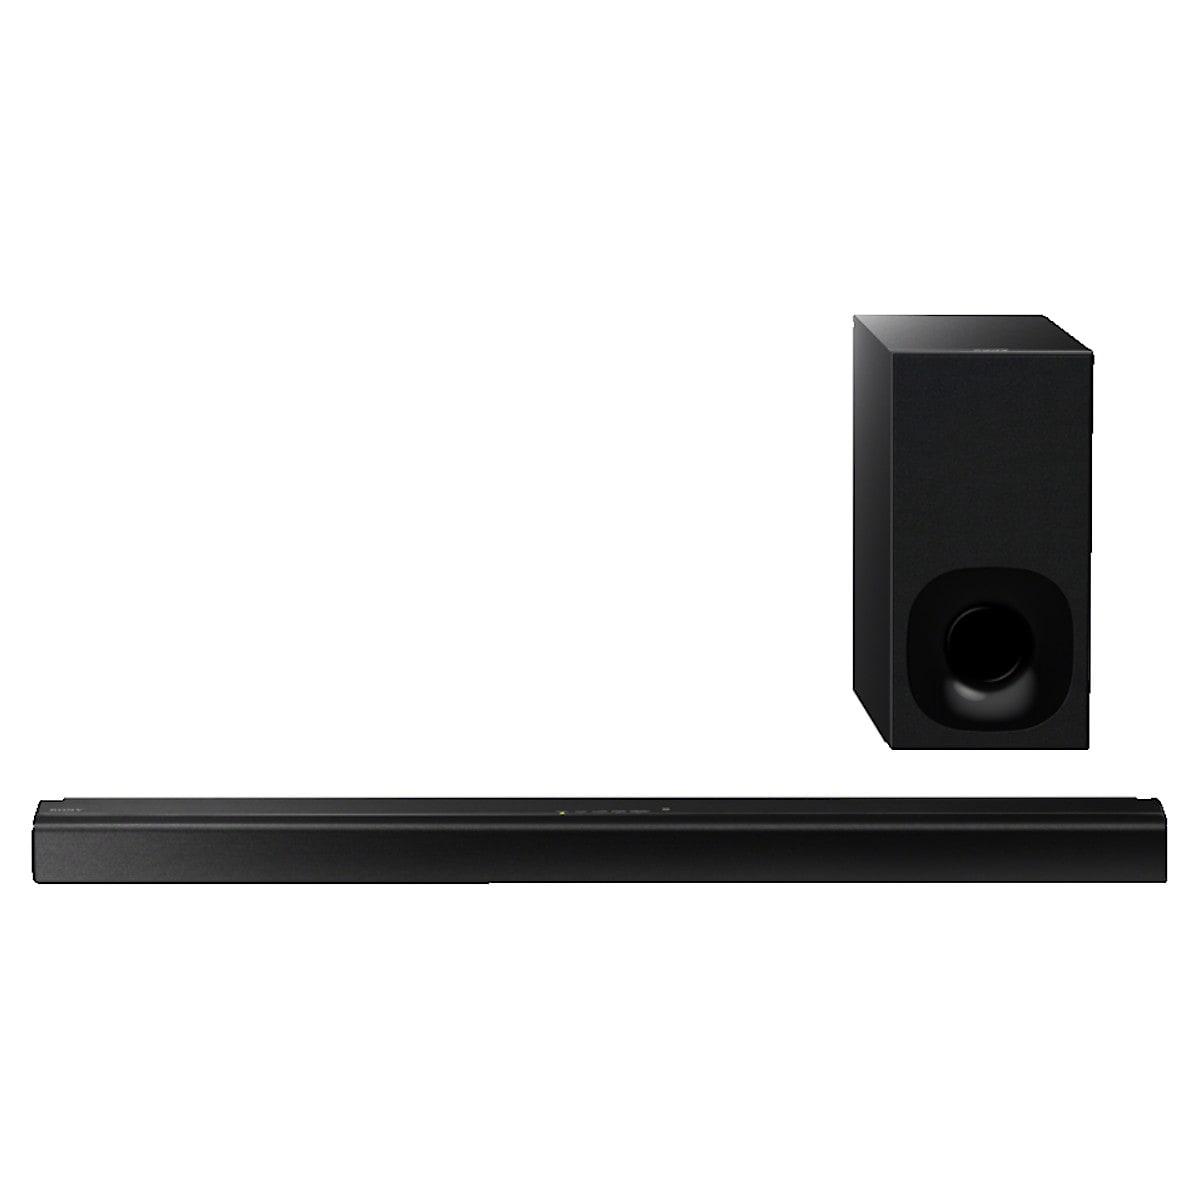 Sony HT-CT180 Soundbar